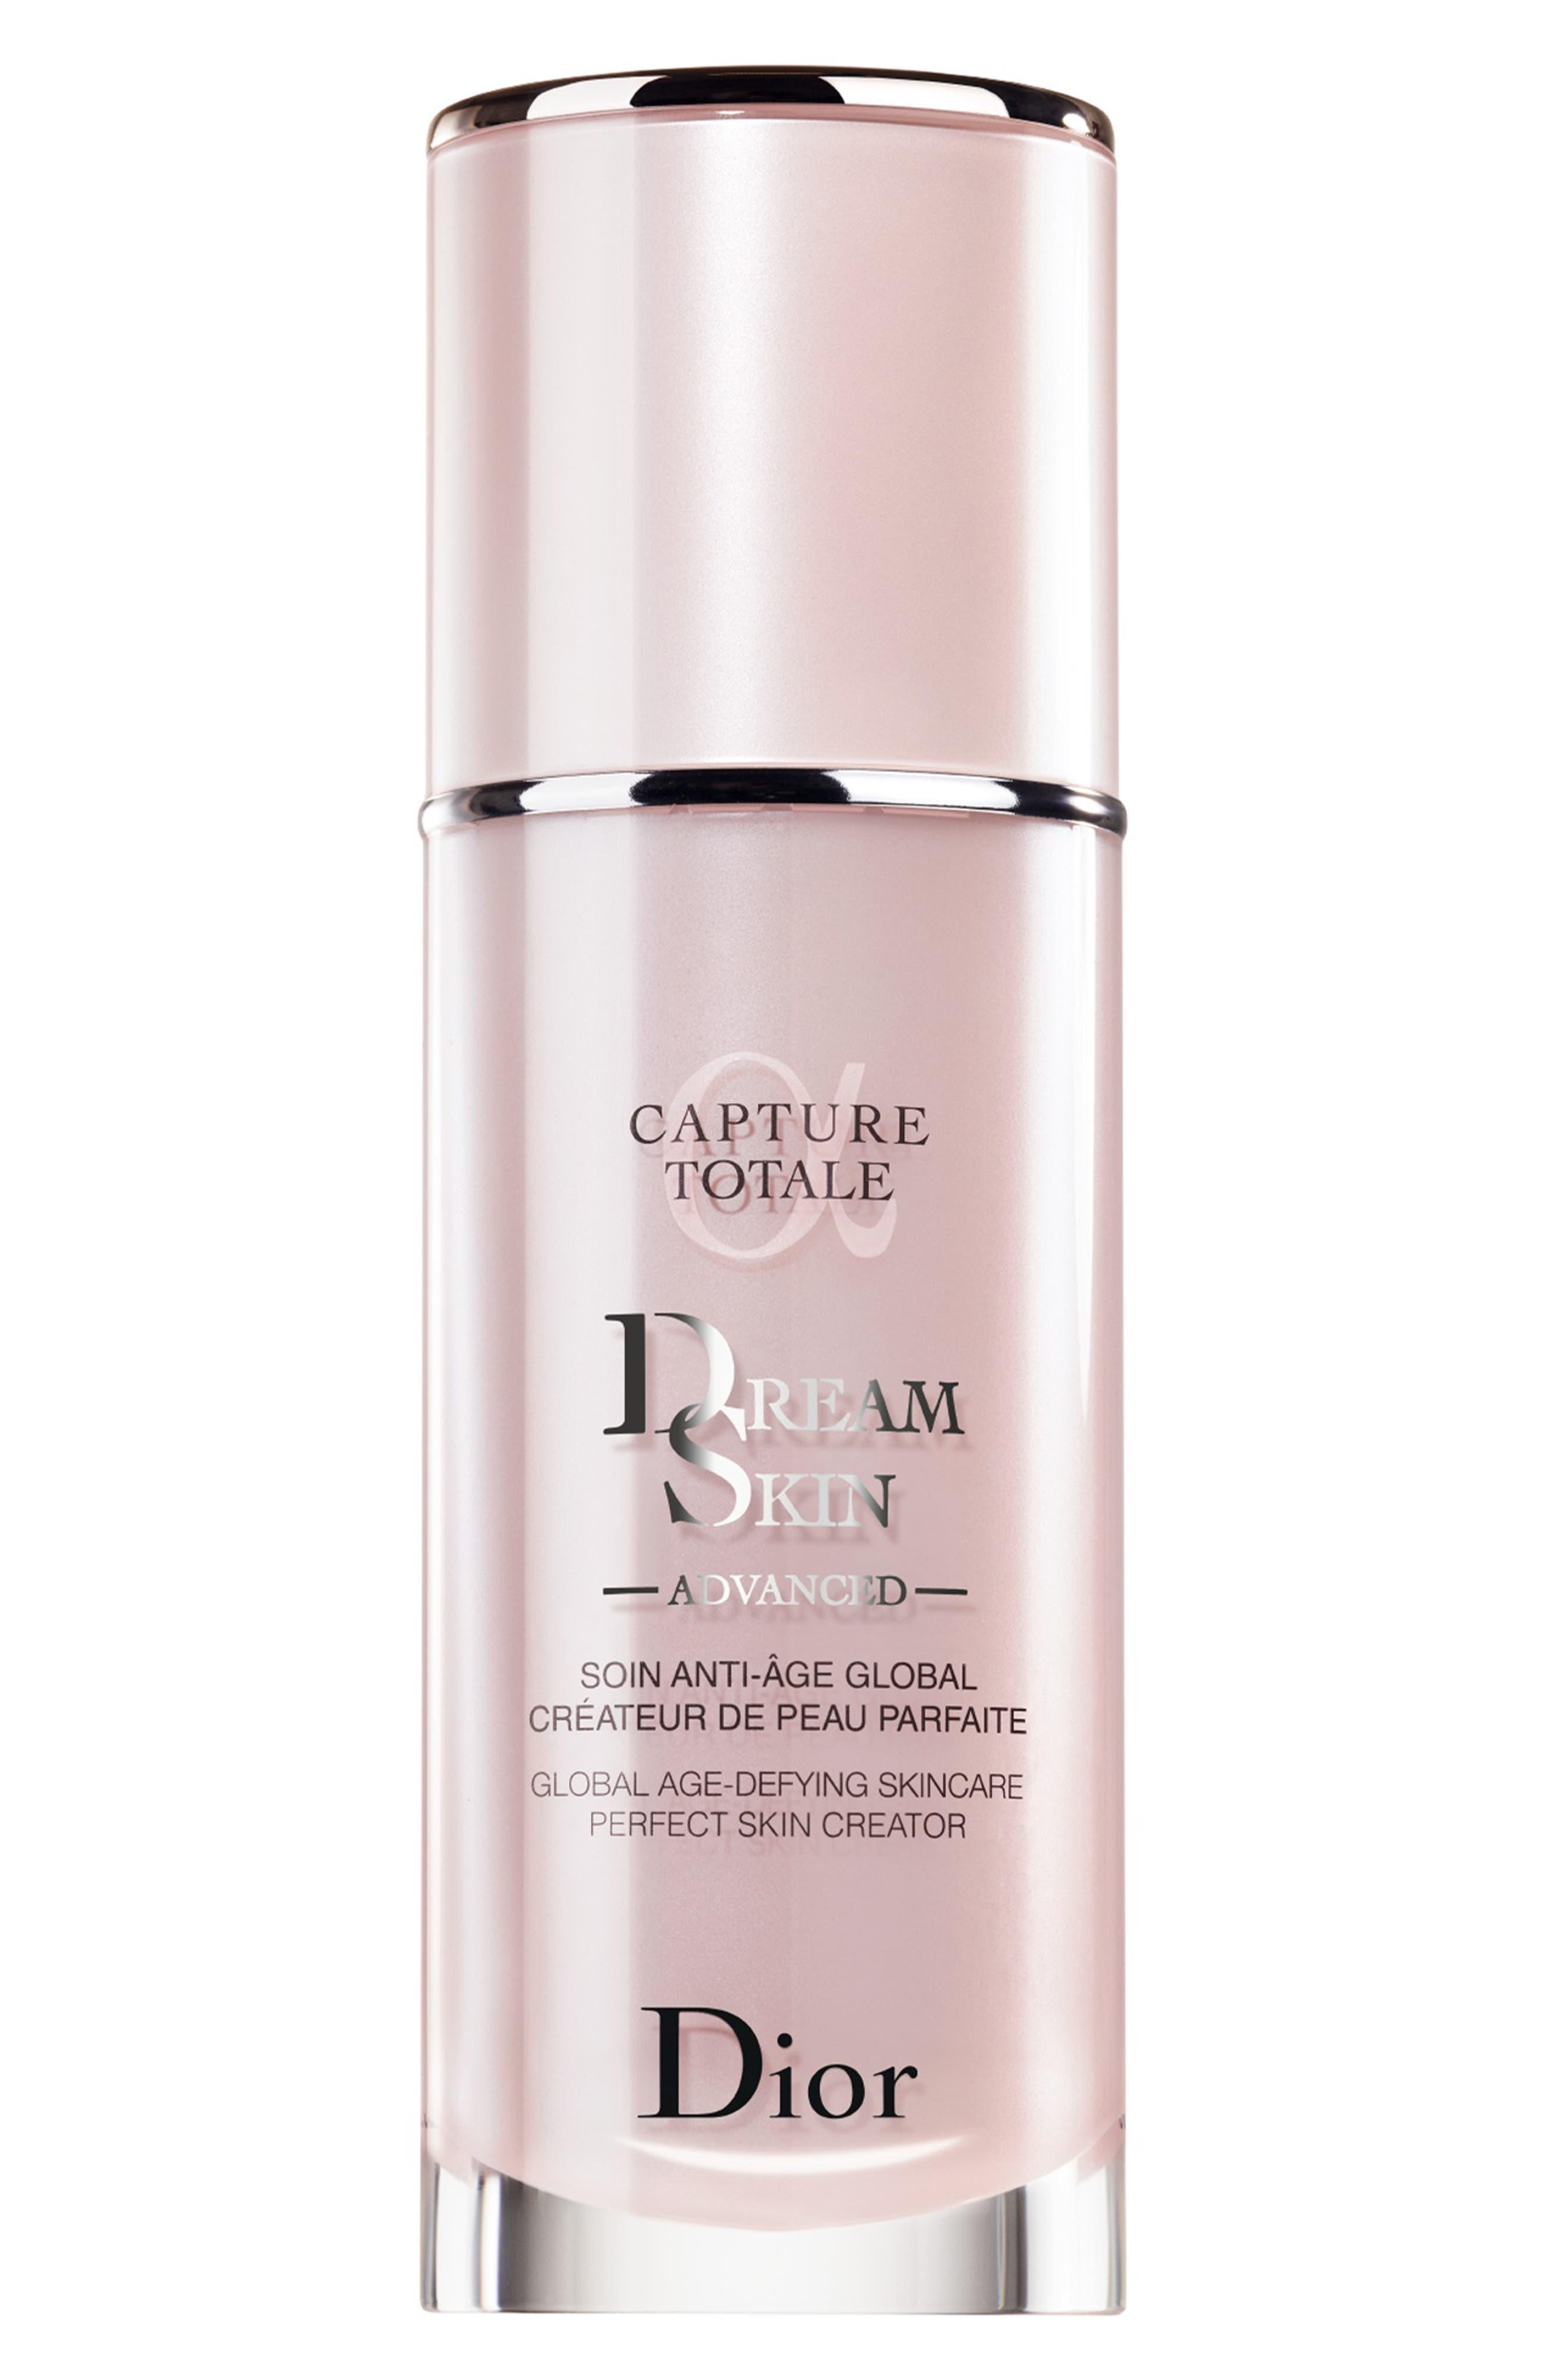 DIOR,                             Capture Totale DreamSkin Advanced Perfect Skin Creator,                             Main thumbnail 1, color,                             NO COLOR